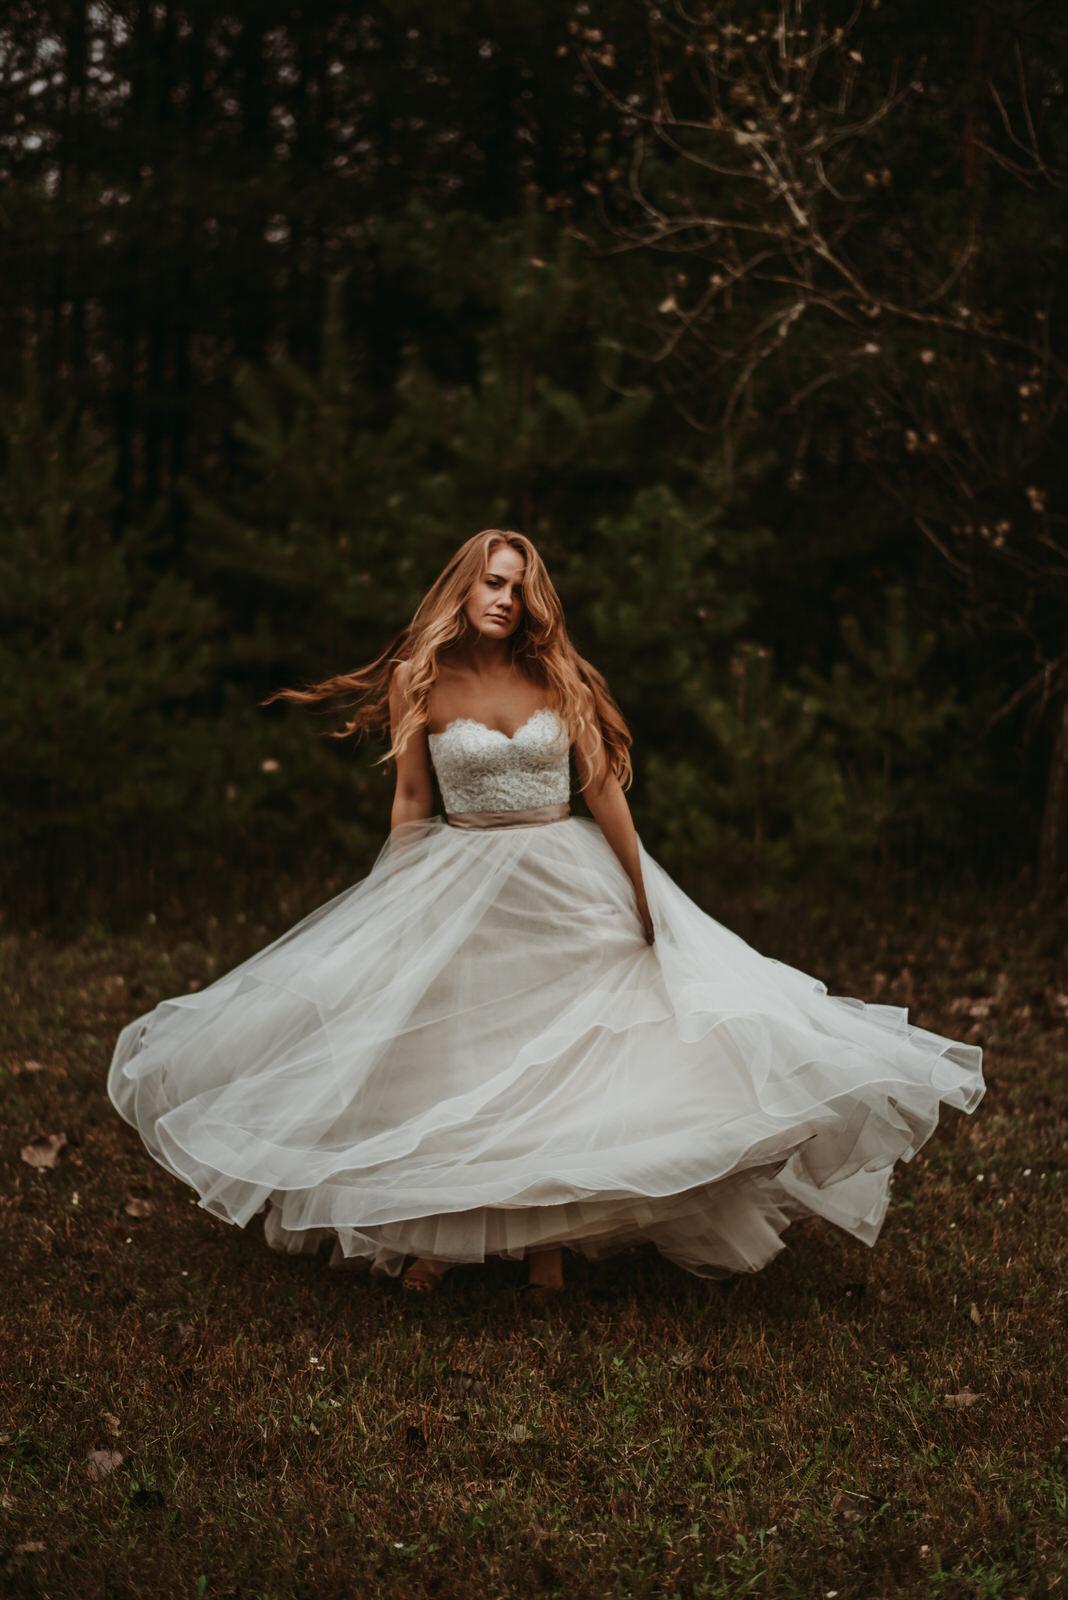 BHLDN wedding dress, moody photography, Chicago wedding photography - The Adamkovi